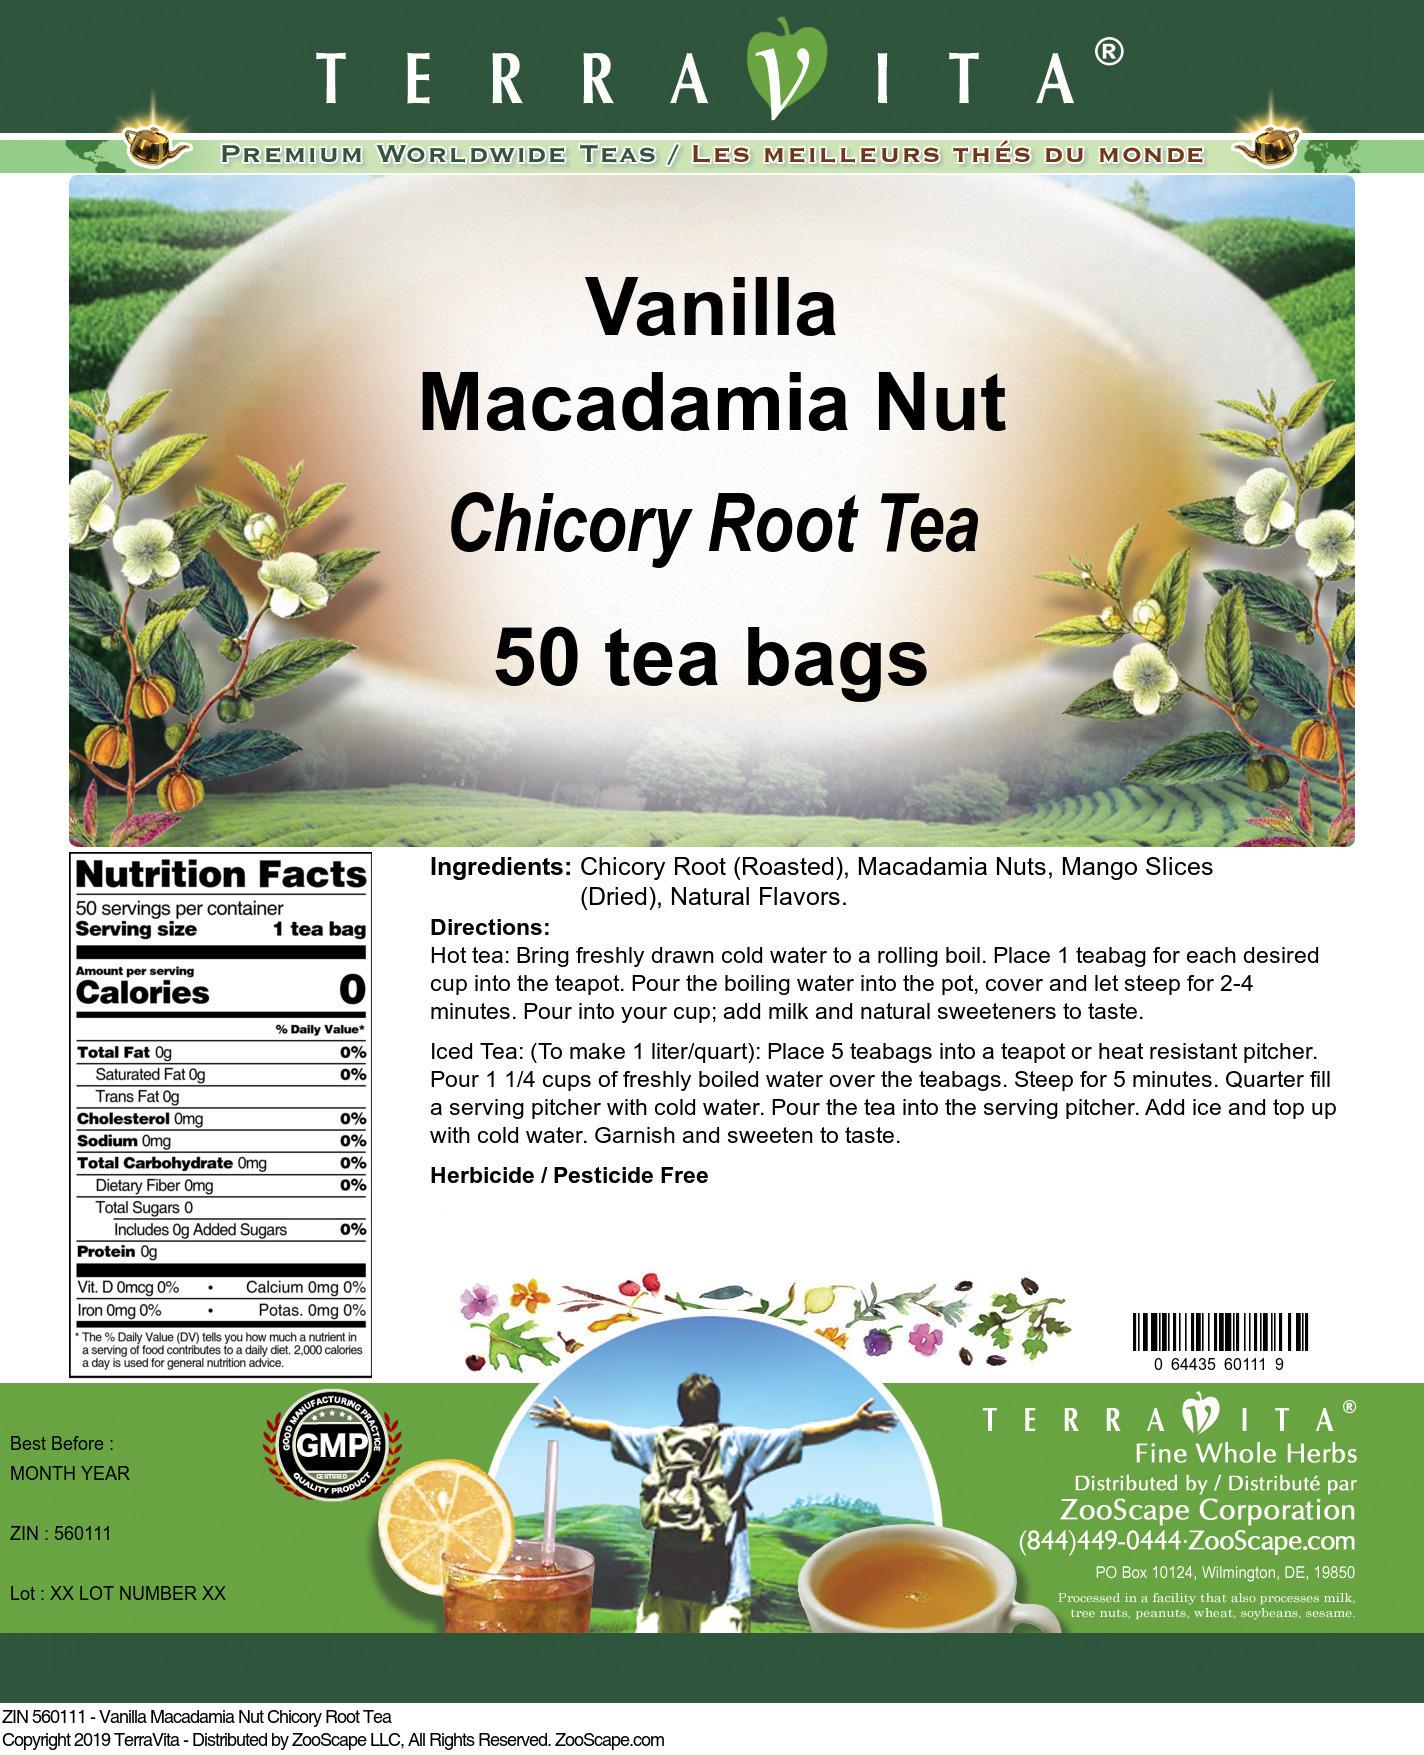 Vanilla Macadamia Nut Chicory Root Tea